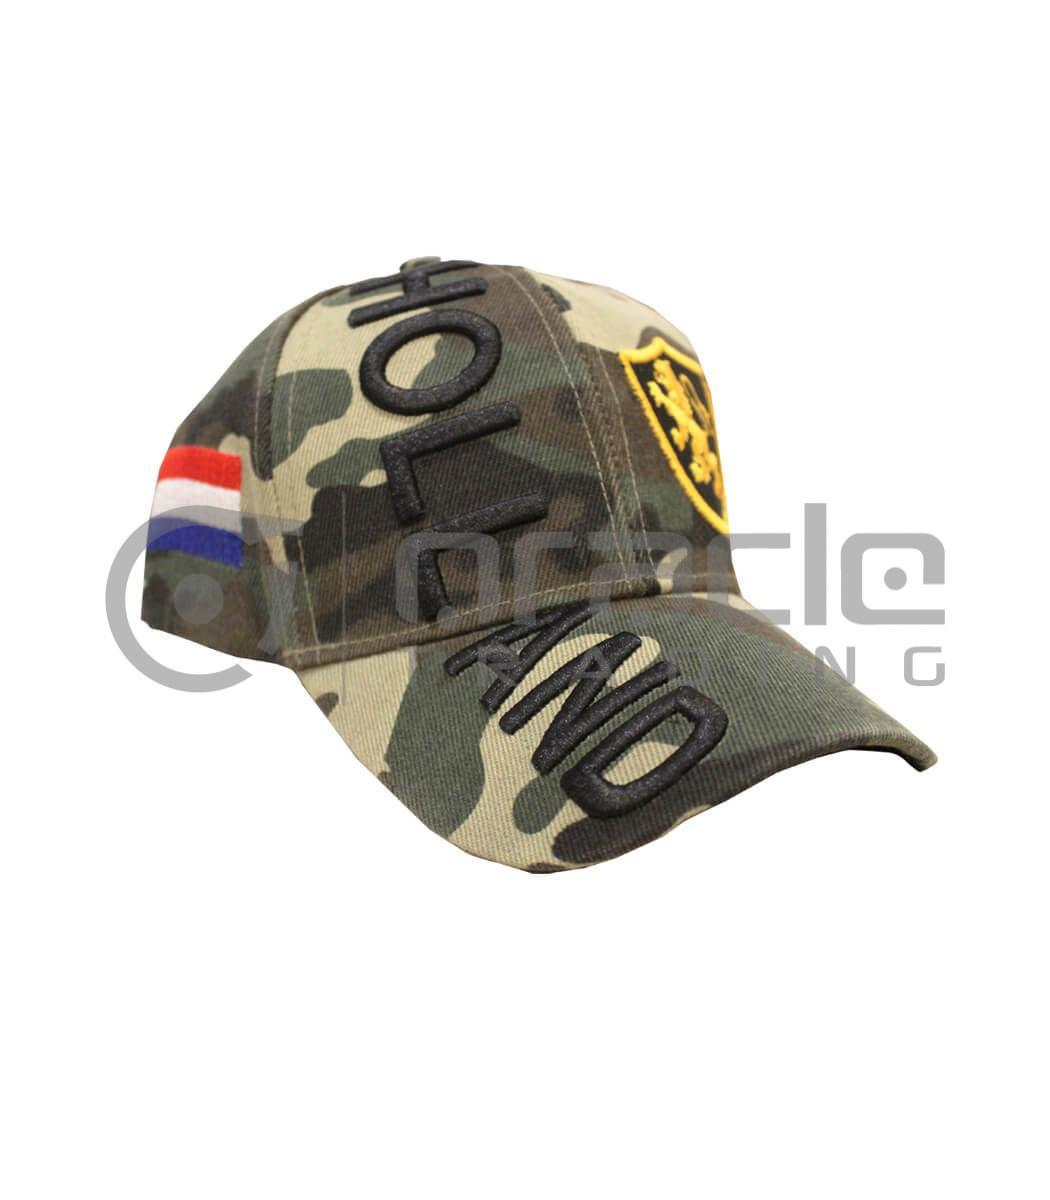 3D Holland Hat - Camo